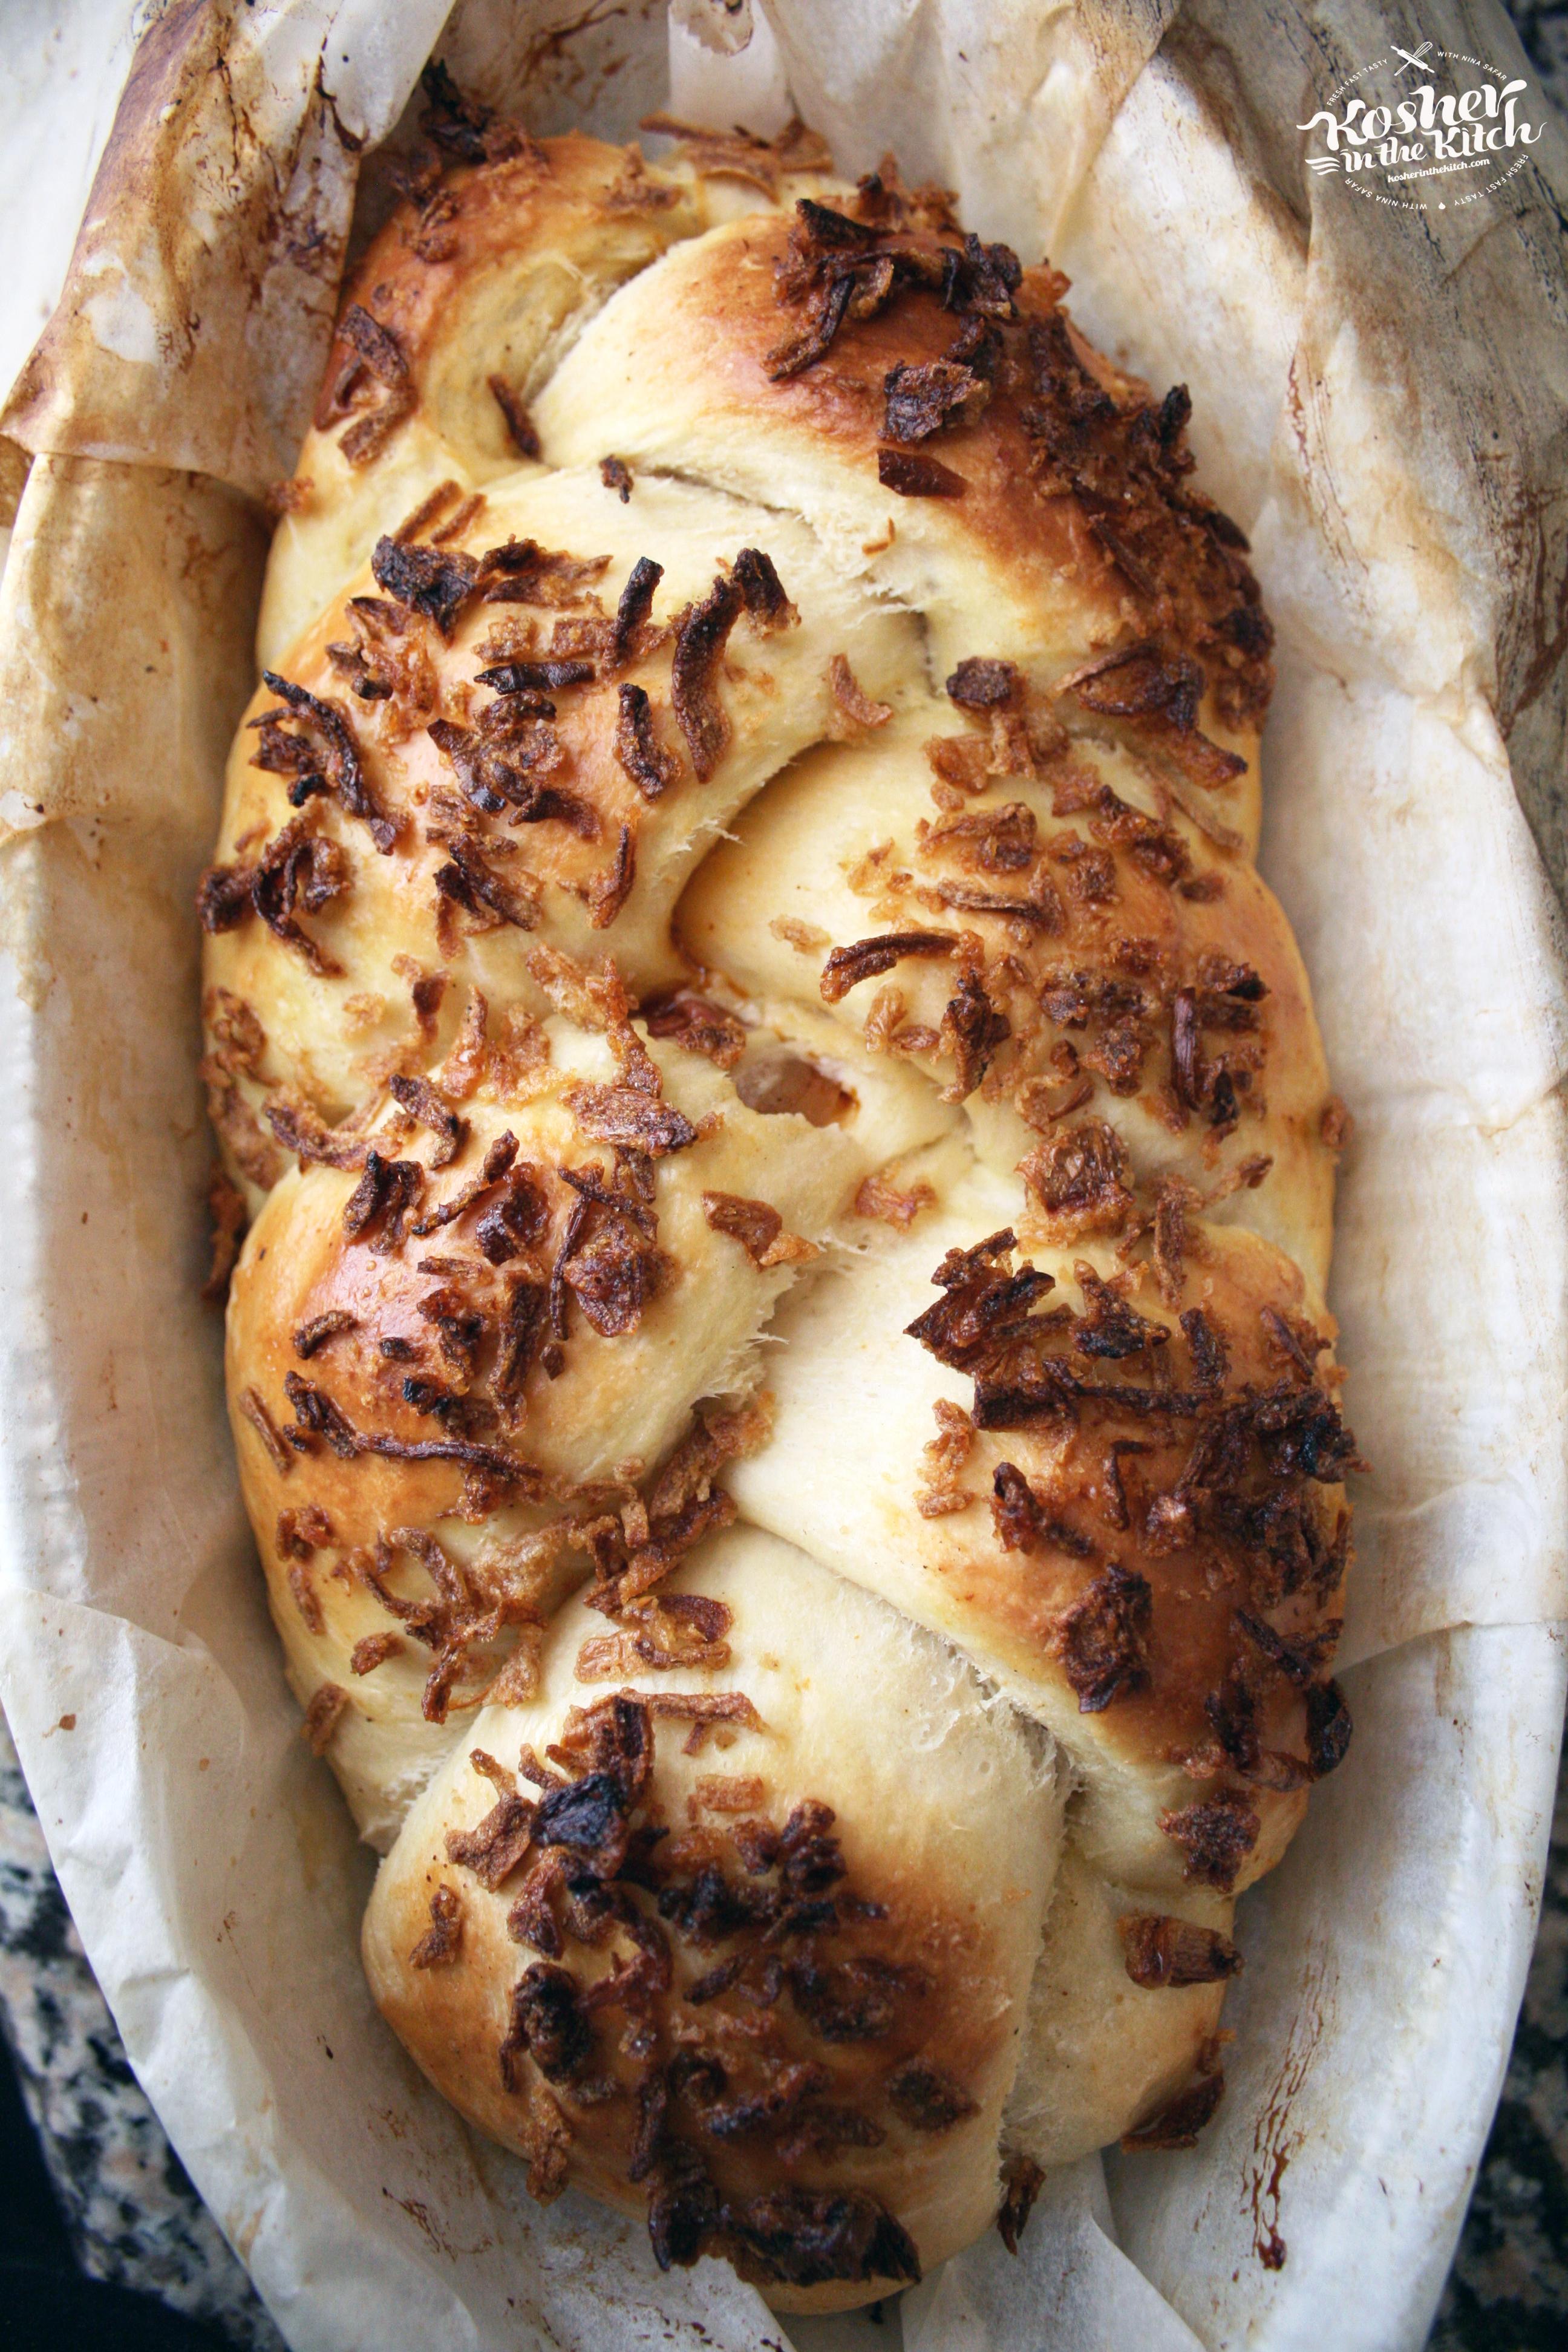 BBQ Pastrami Stuffed Challah